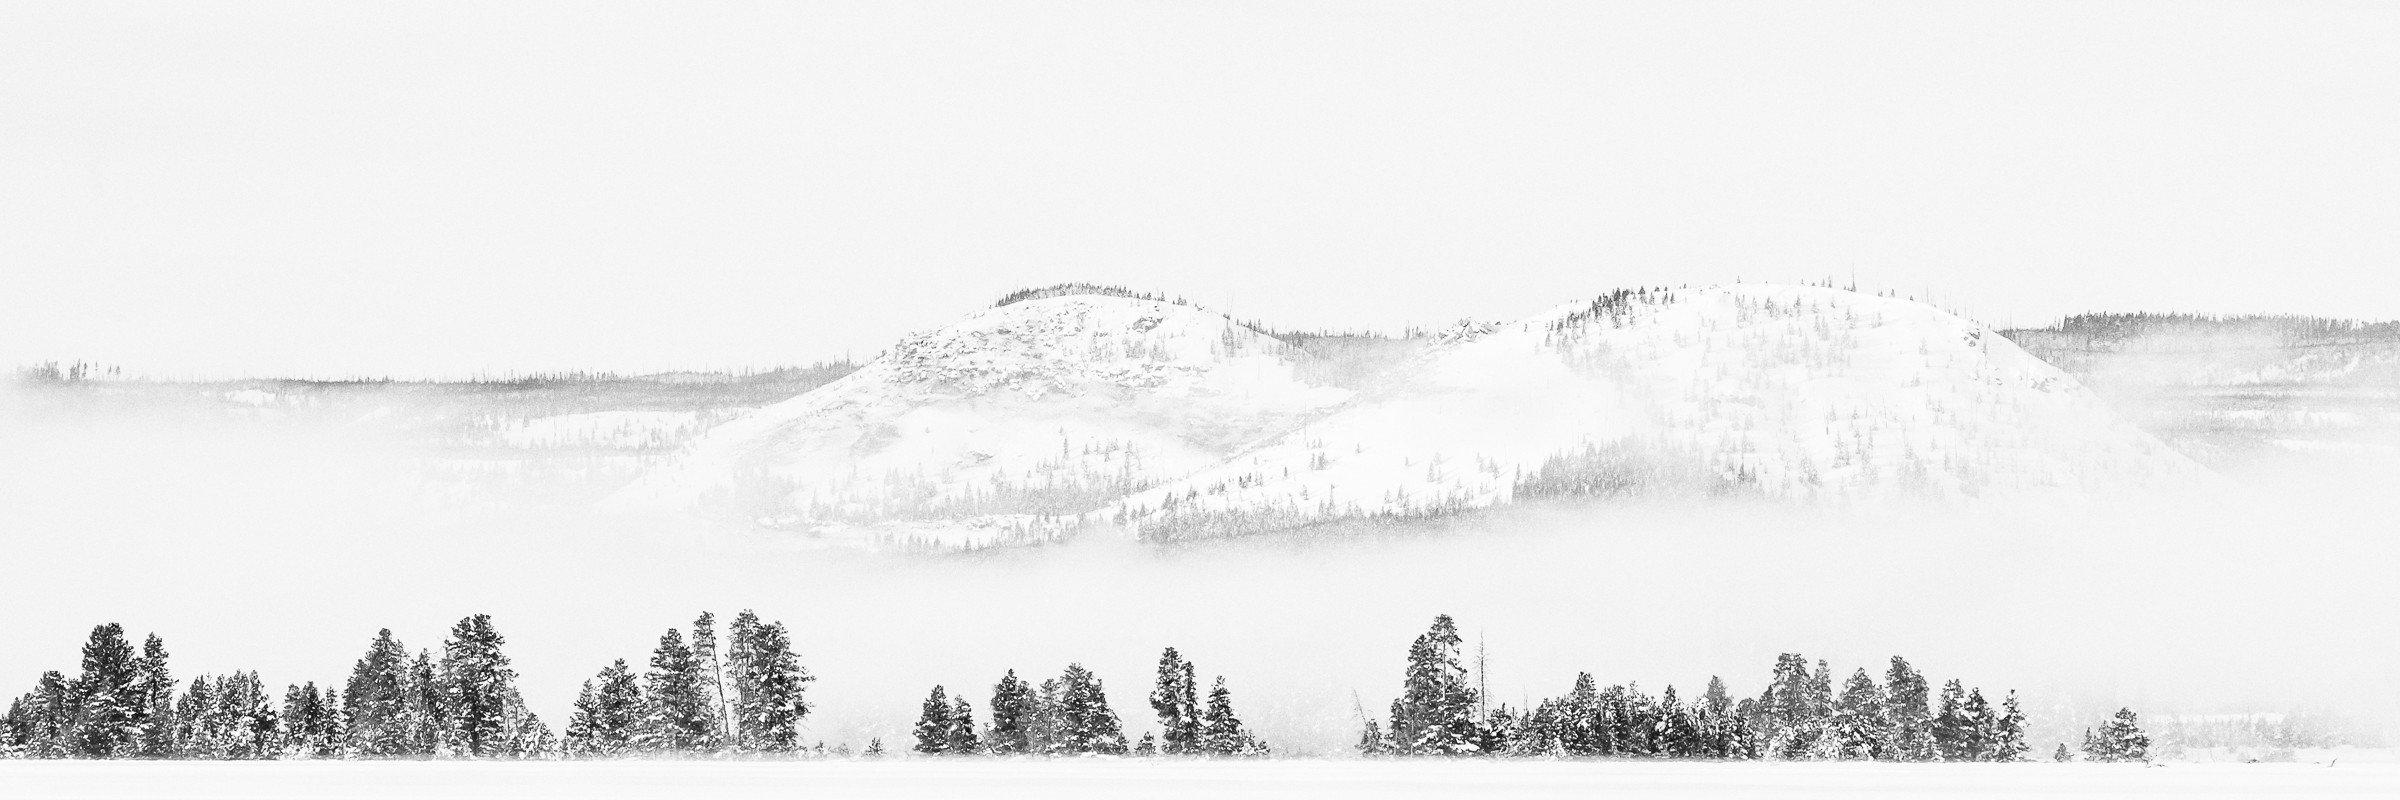 landschap Yellowstone 0992